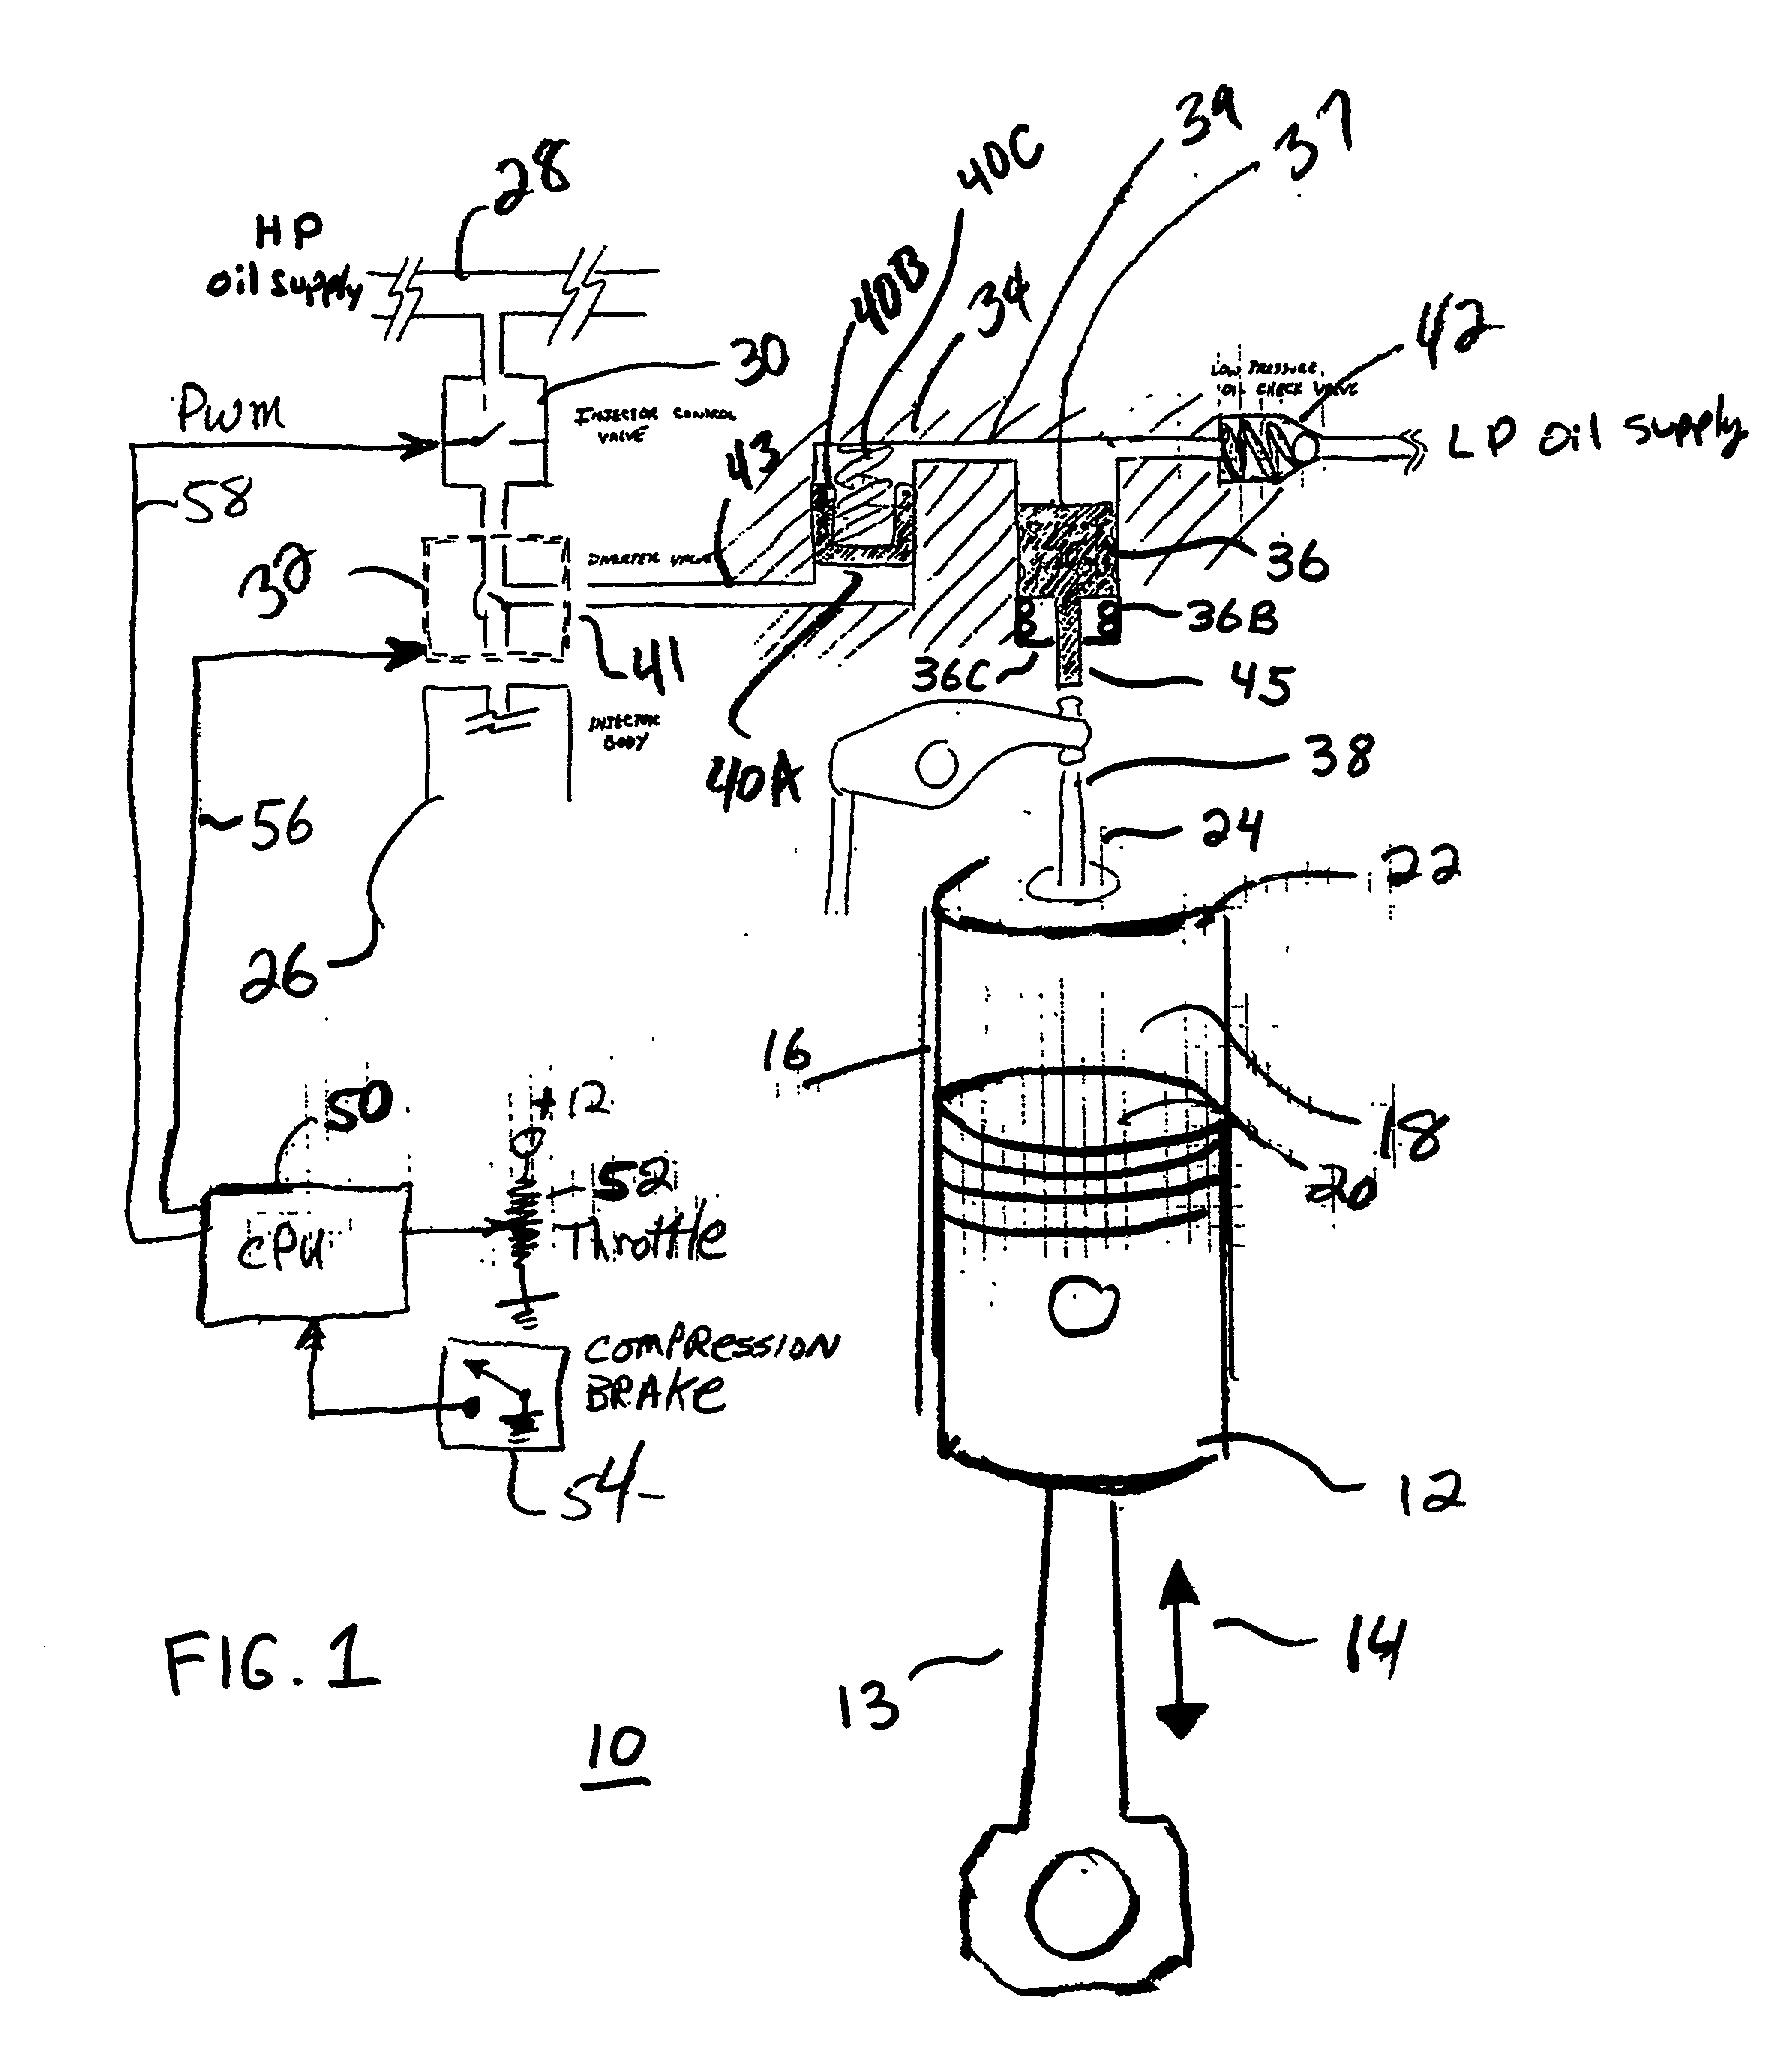 hight resolution of 2006 international dt466 ecm wiring diagram international 4300 wiring schematic 2007 international 4300 dt466 icp sensor location